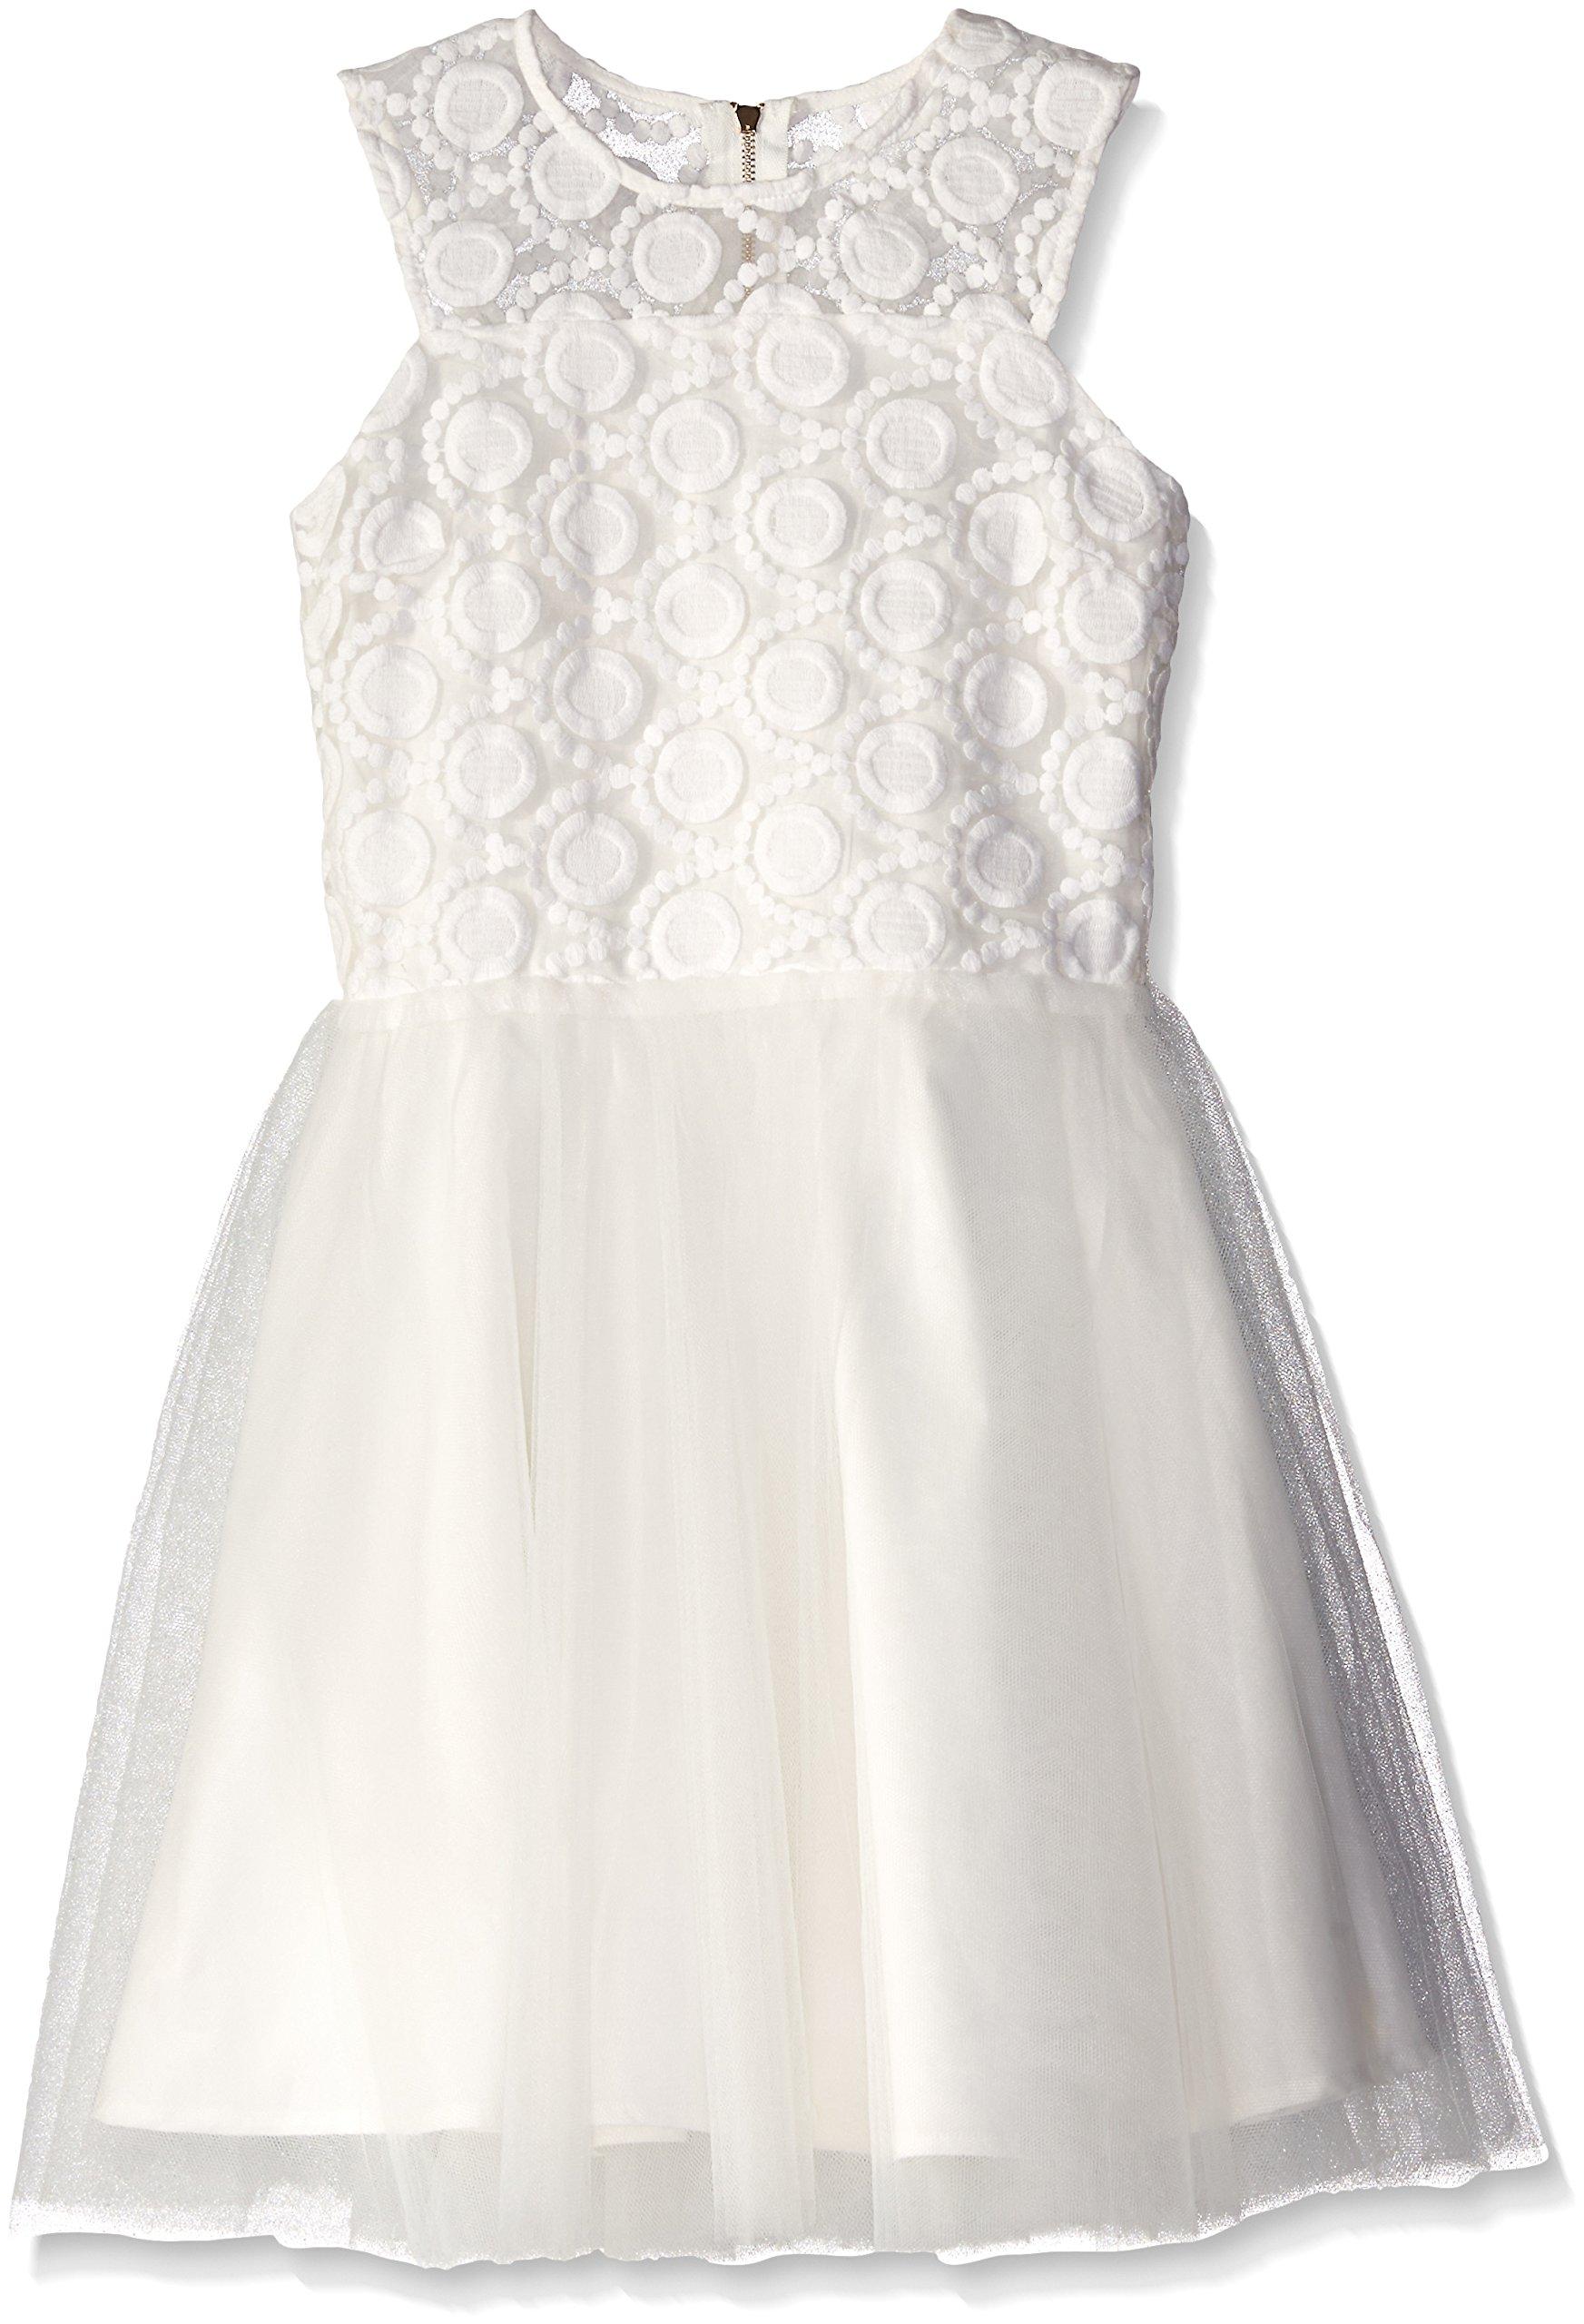 Miss Behave Big Girls' Emily Dress, White, Large